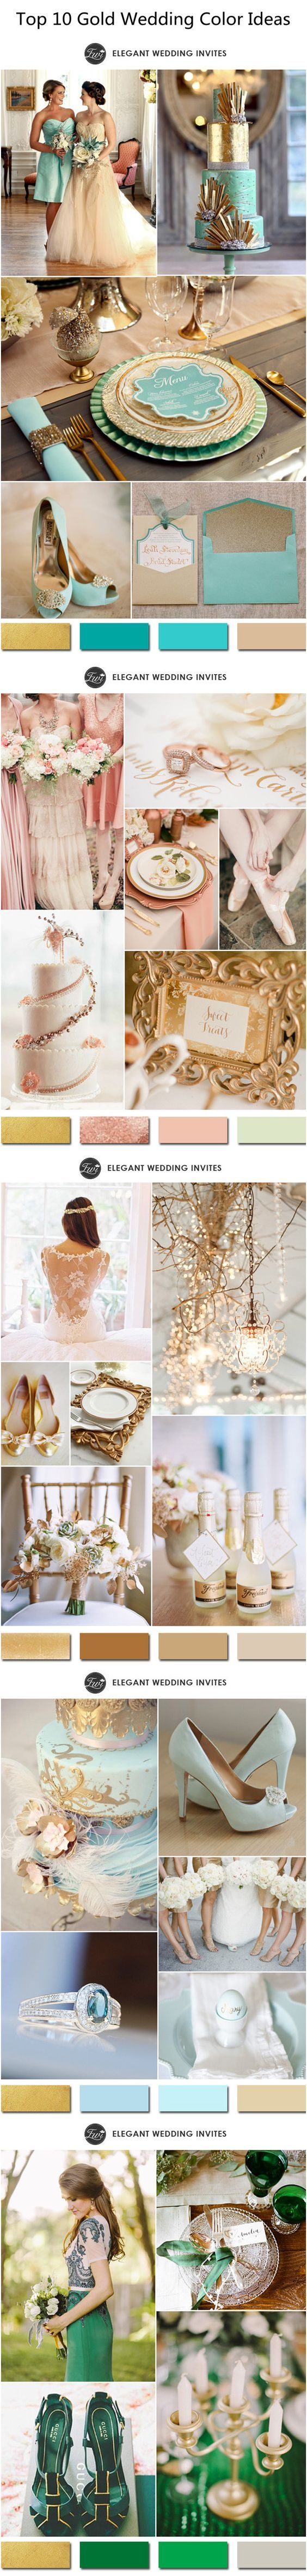 Top 10 Gold Wedding Trend Ideas #weddingcolors #dreamwedding